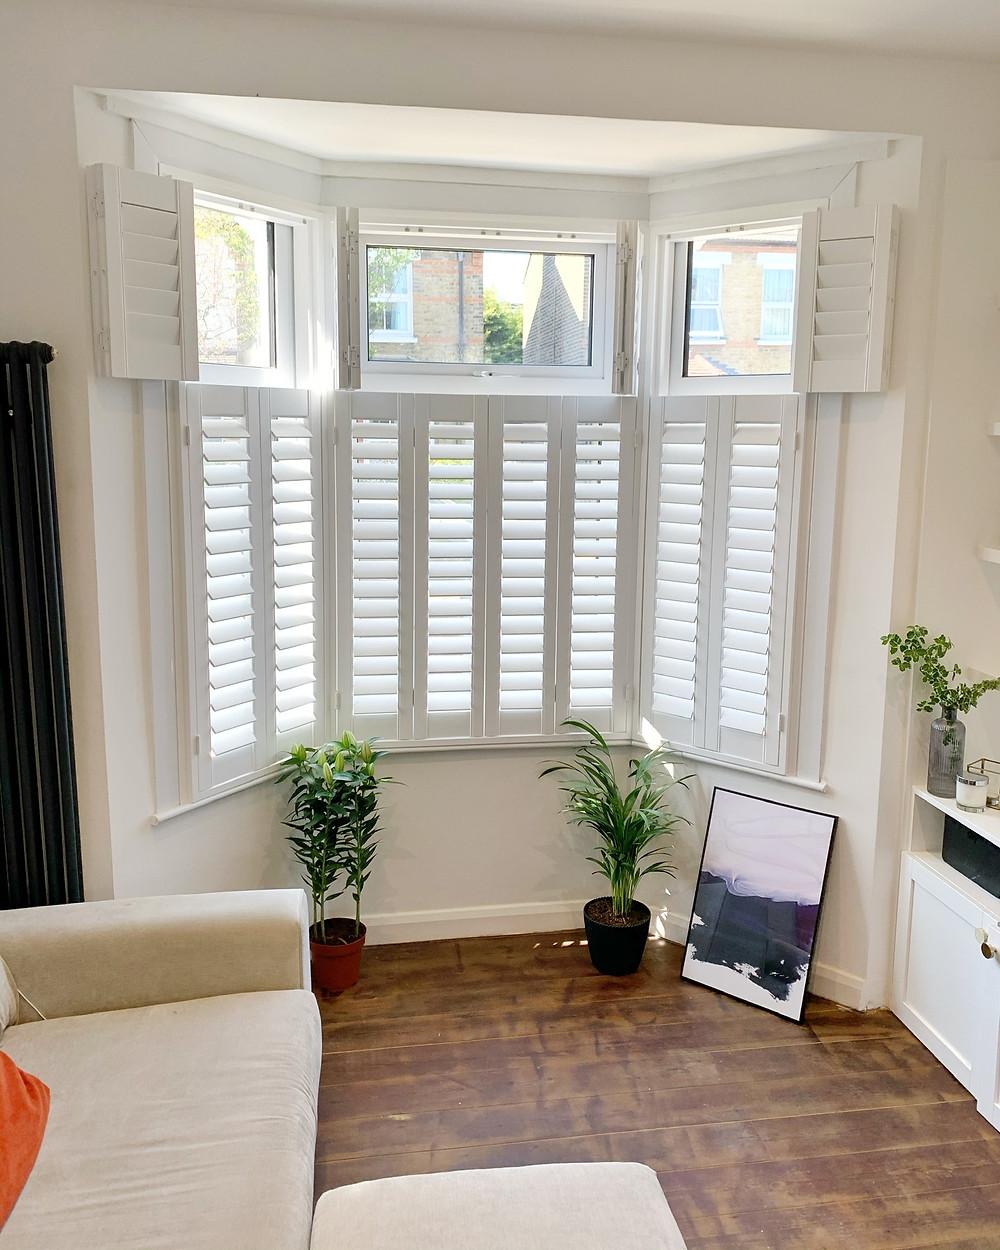 Tier on tier white wooden shutters